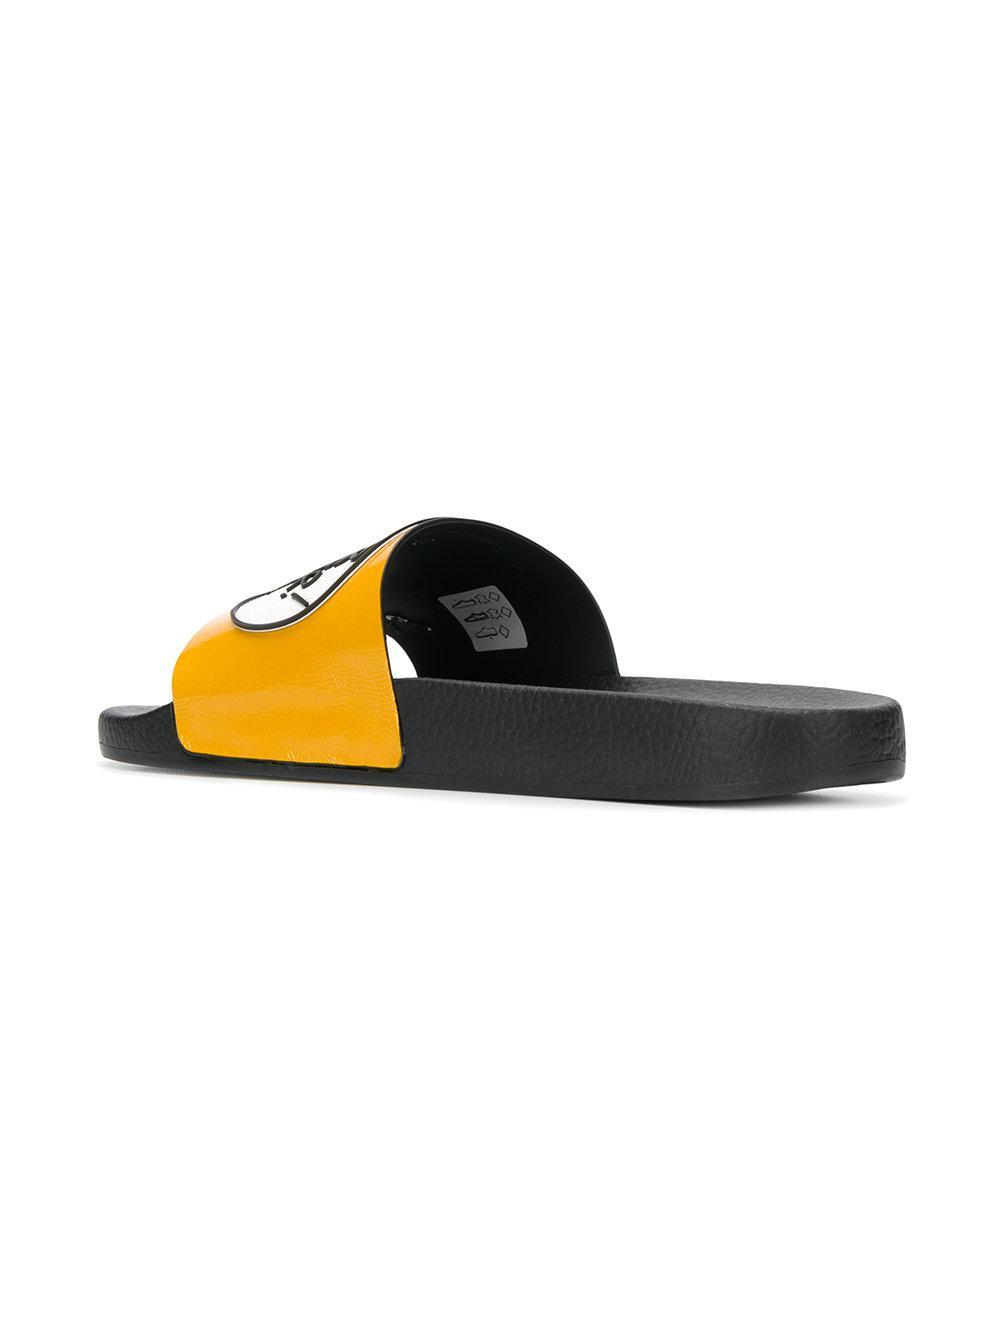 Marketable Online New Fashion Style Of comic book print slides - Yellow & Orange Moncler 5YjdJV2